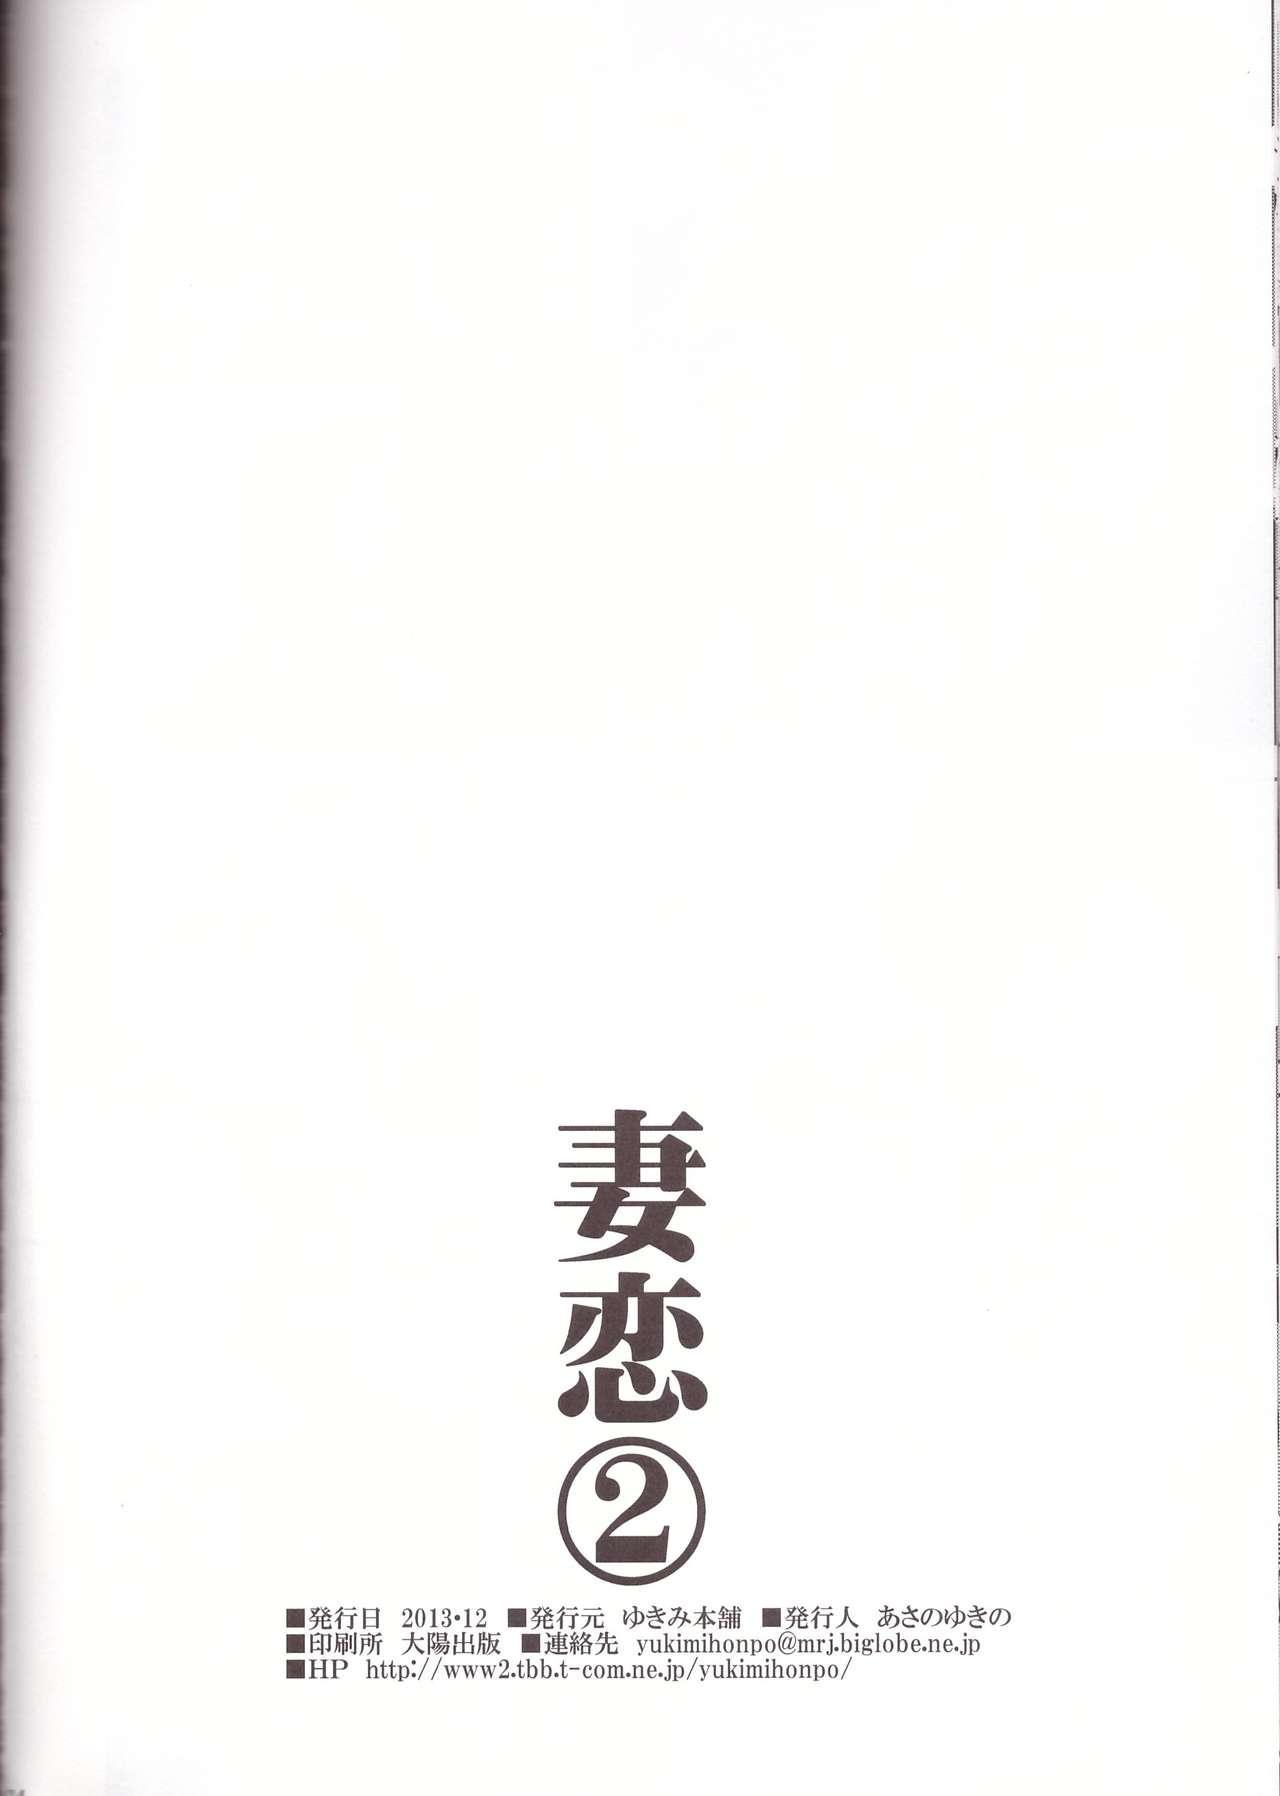 Tsuma koi2 23